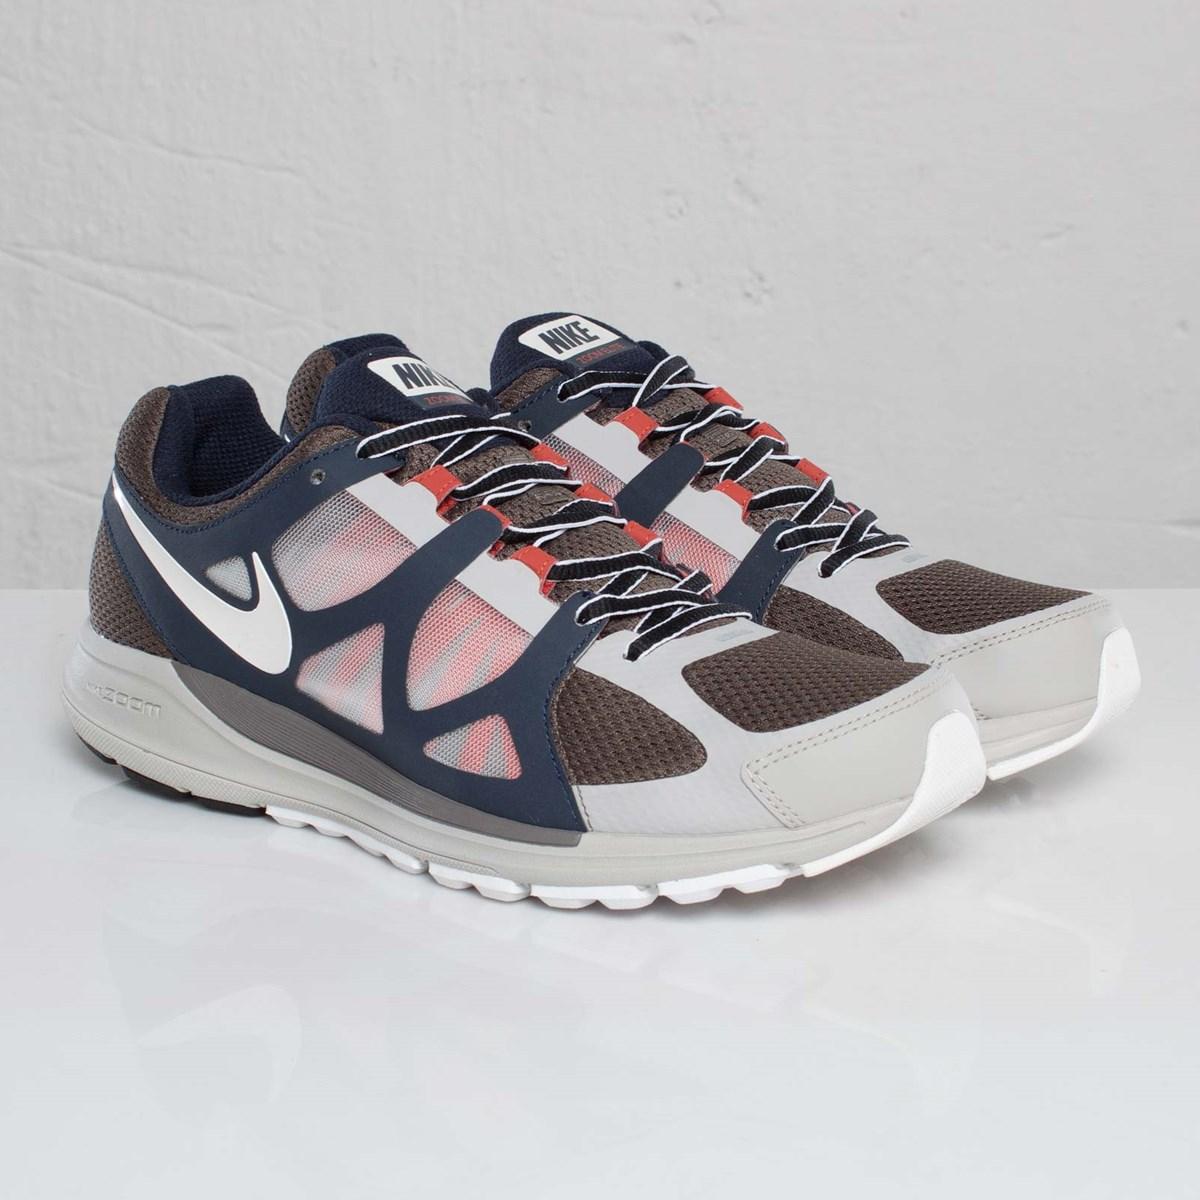 innovative design 046e3 1905c ... Nike Zoom Elite+ JP - 109657 - Sneakersnstuff sneakers streetwear på nätet  sen 1999 ...